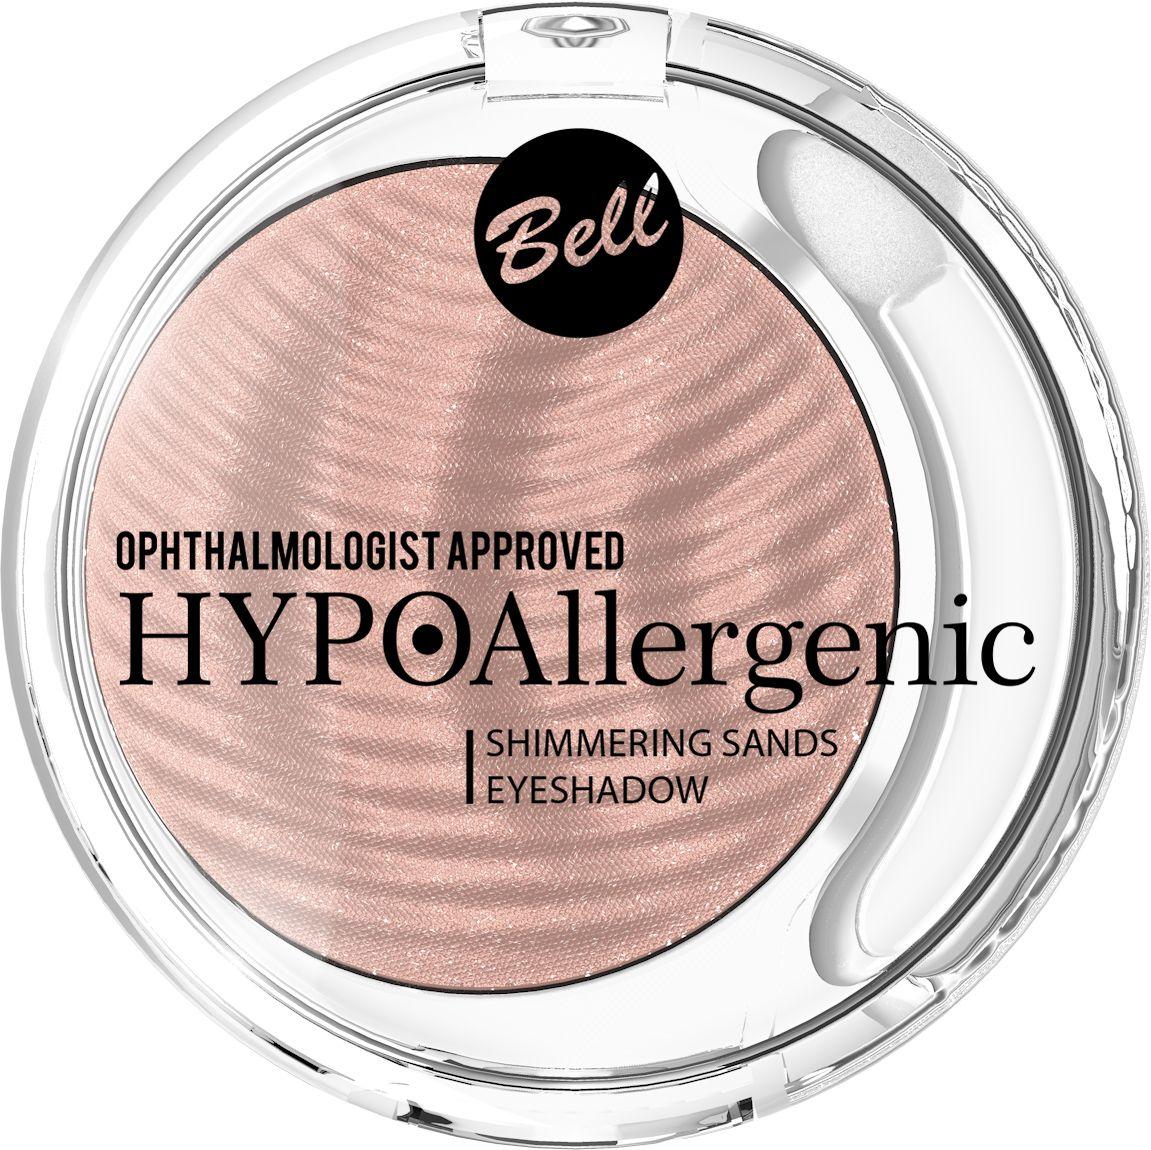 Bell Hypoallergenic Кремовые тени для век Shimmering Sands Eyeshadow, Тон №0265500714